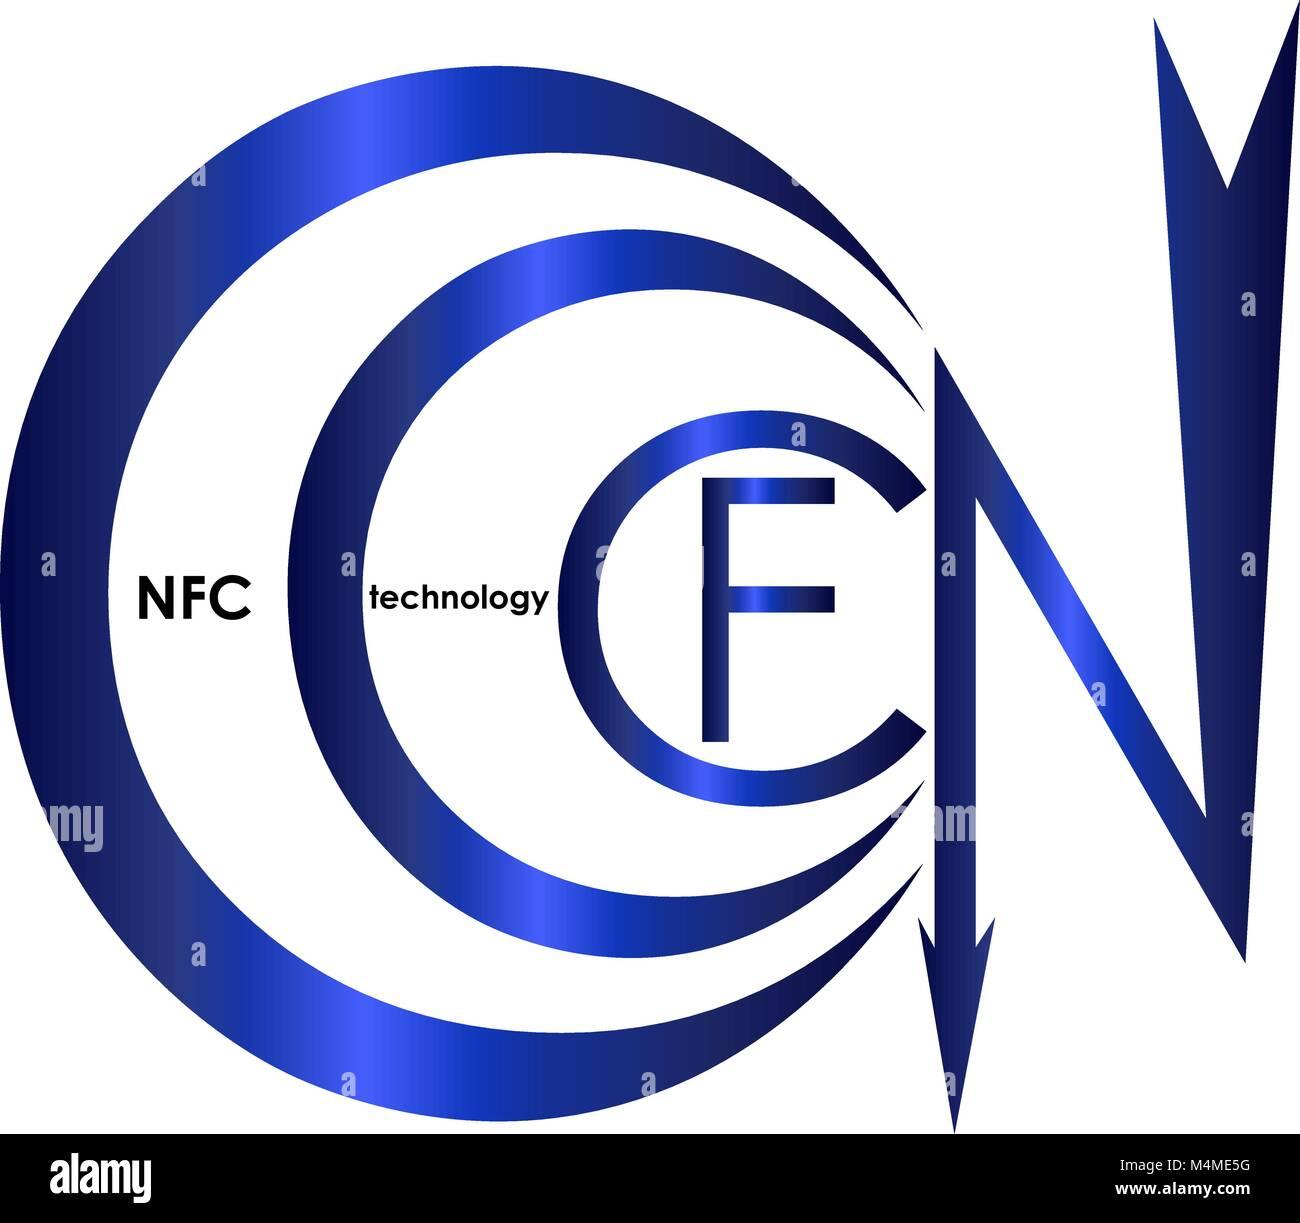 contactless payment technologies NFC logo - Stock Image